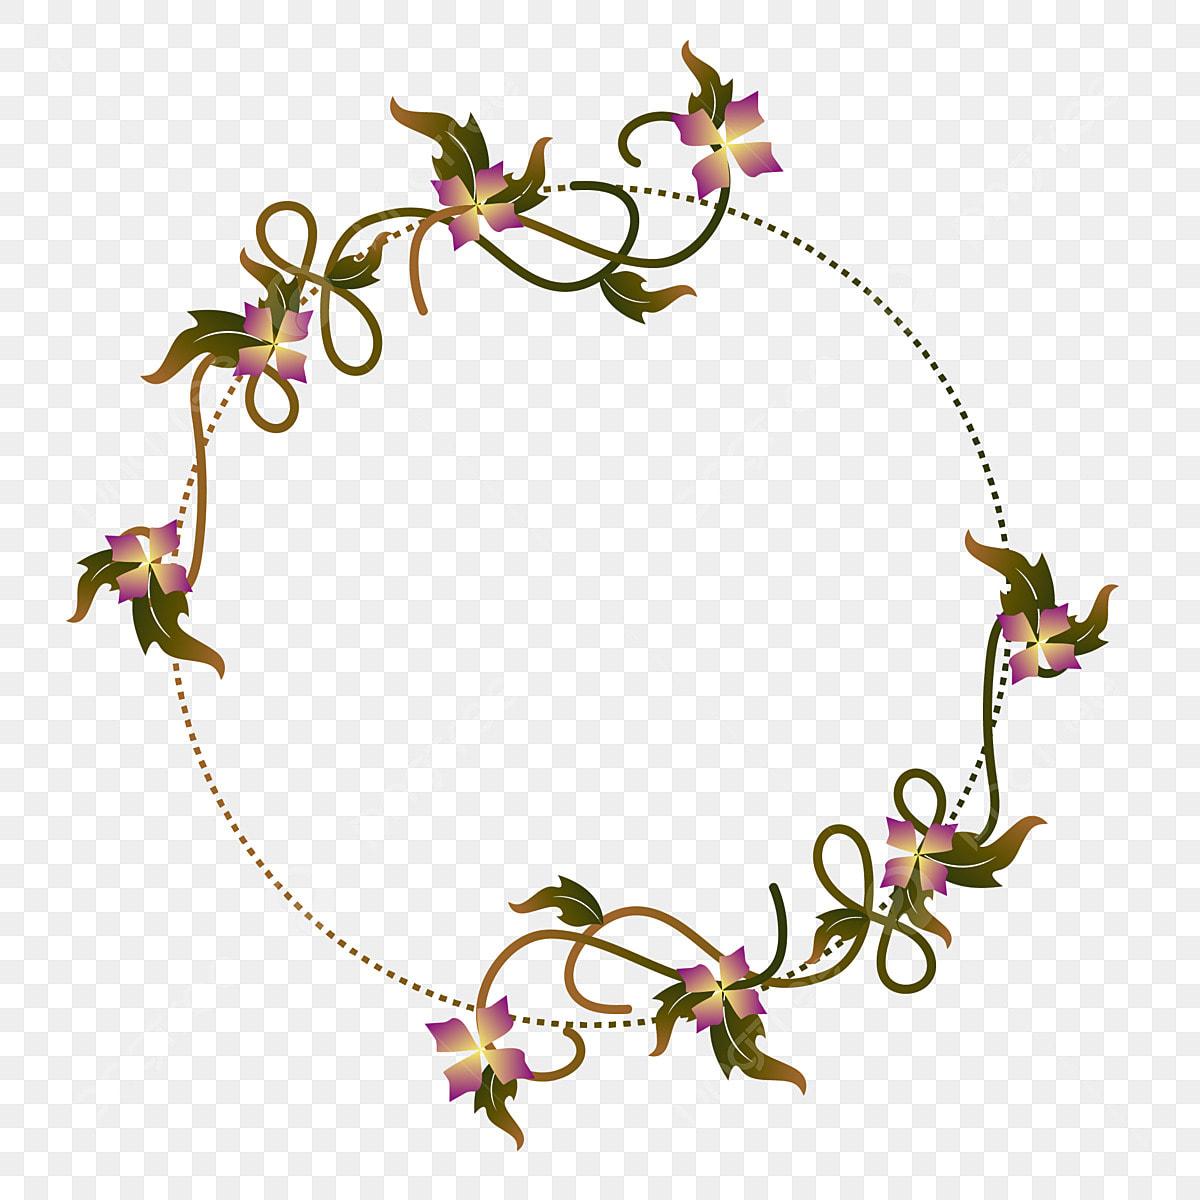 Simple Green Floral Vine Border Decorative Element Design Simple